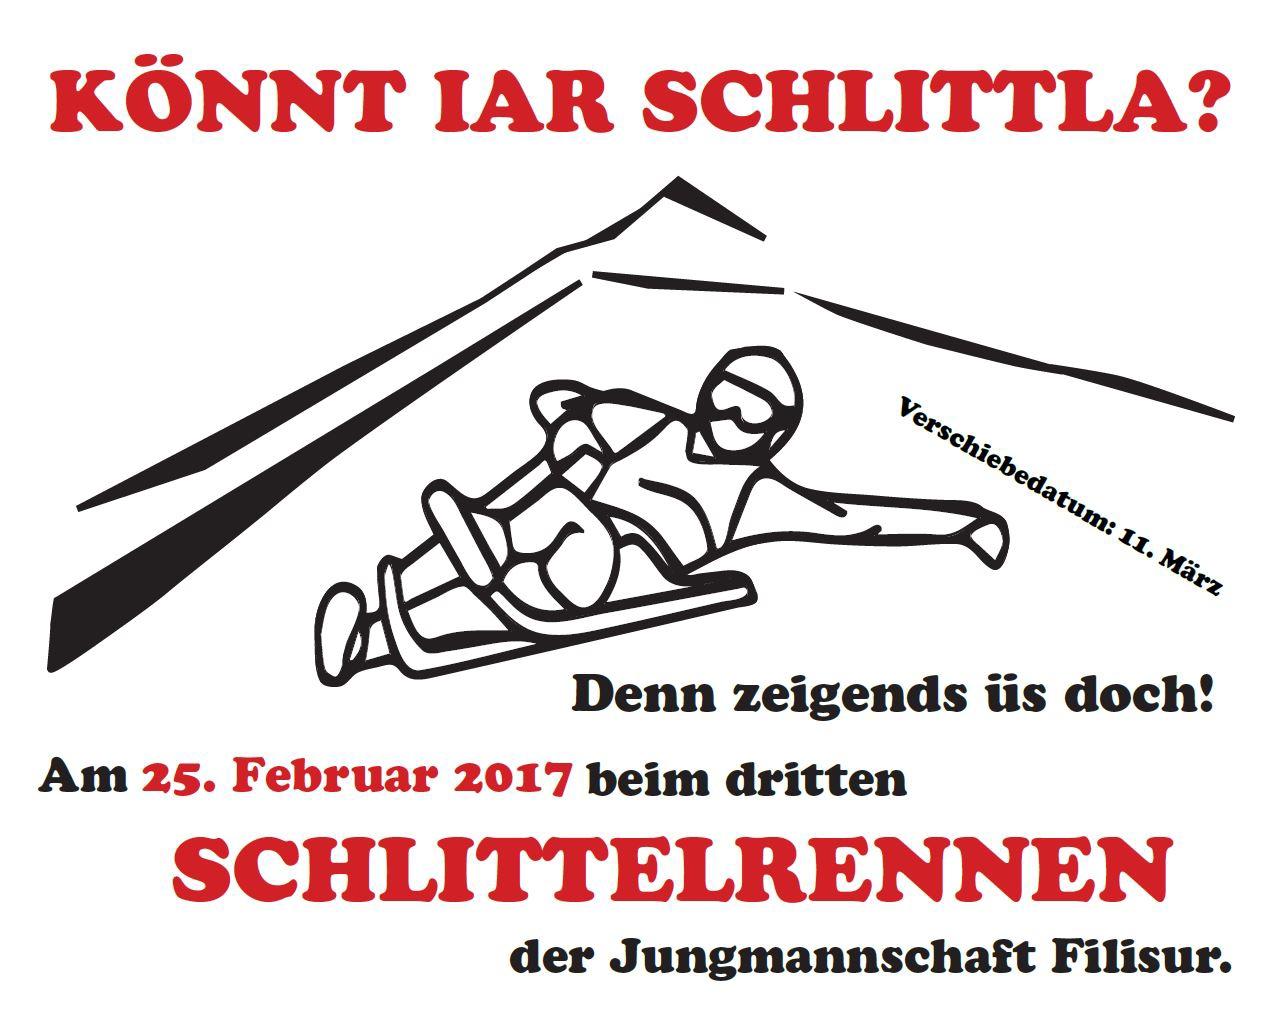 3. Schlittelrennen Sela - Filisur der Jungmannschaft Filisur